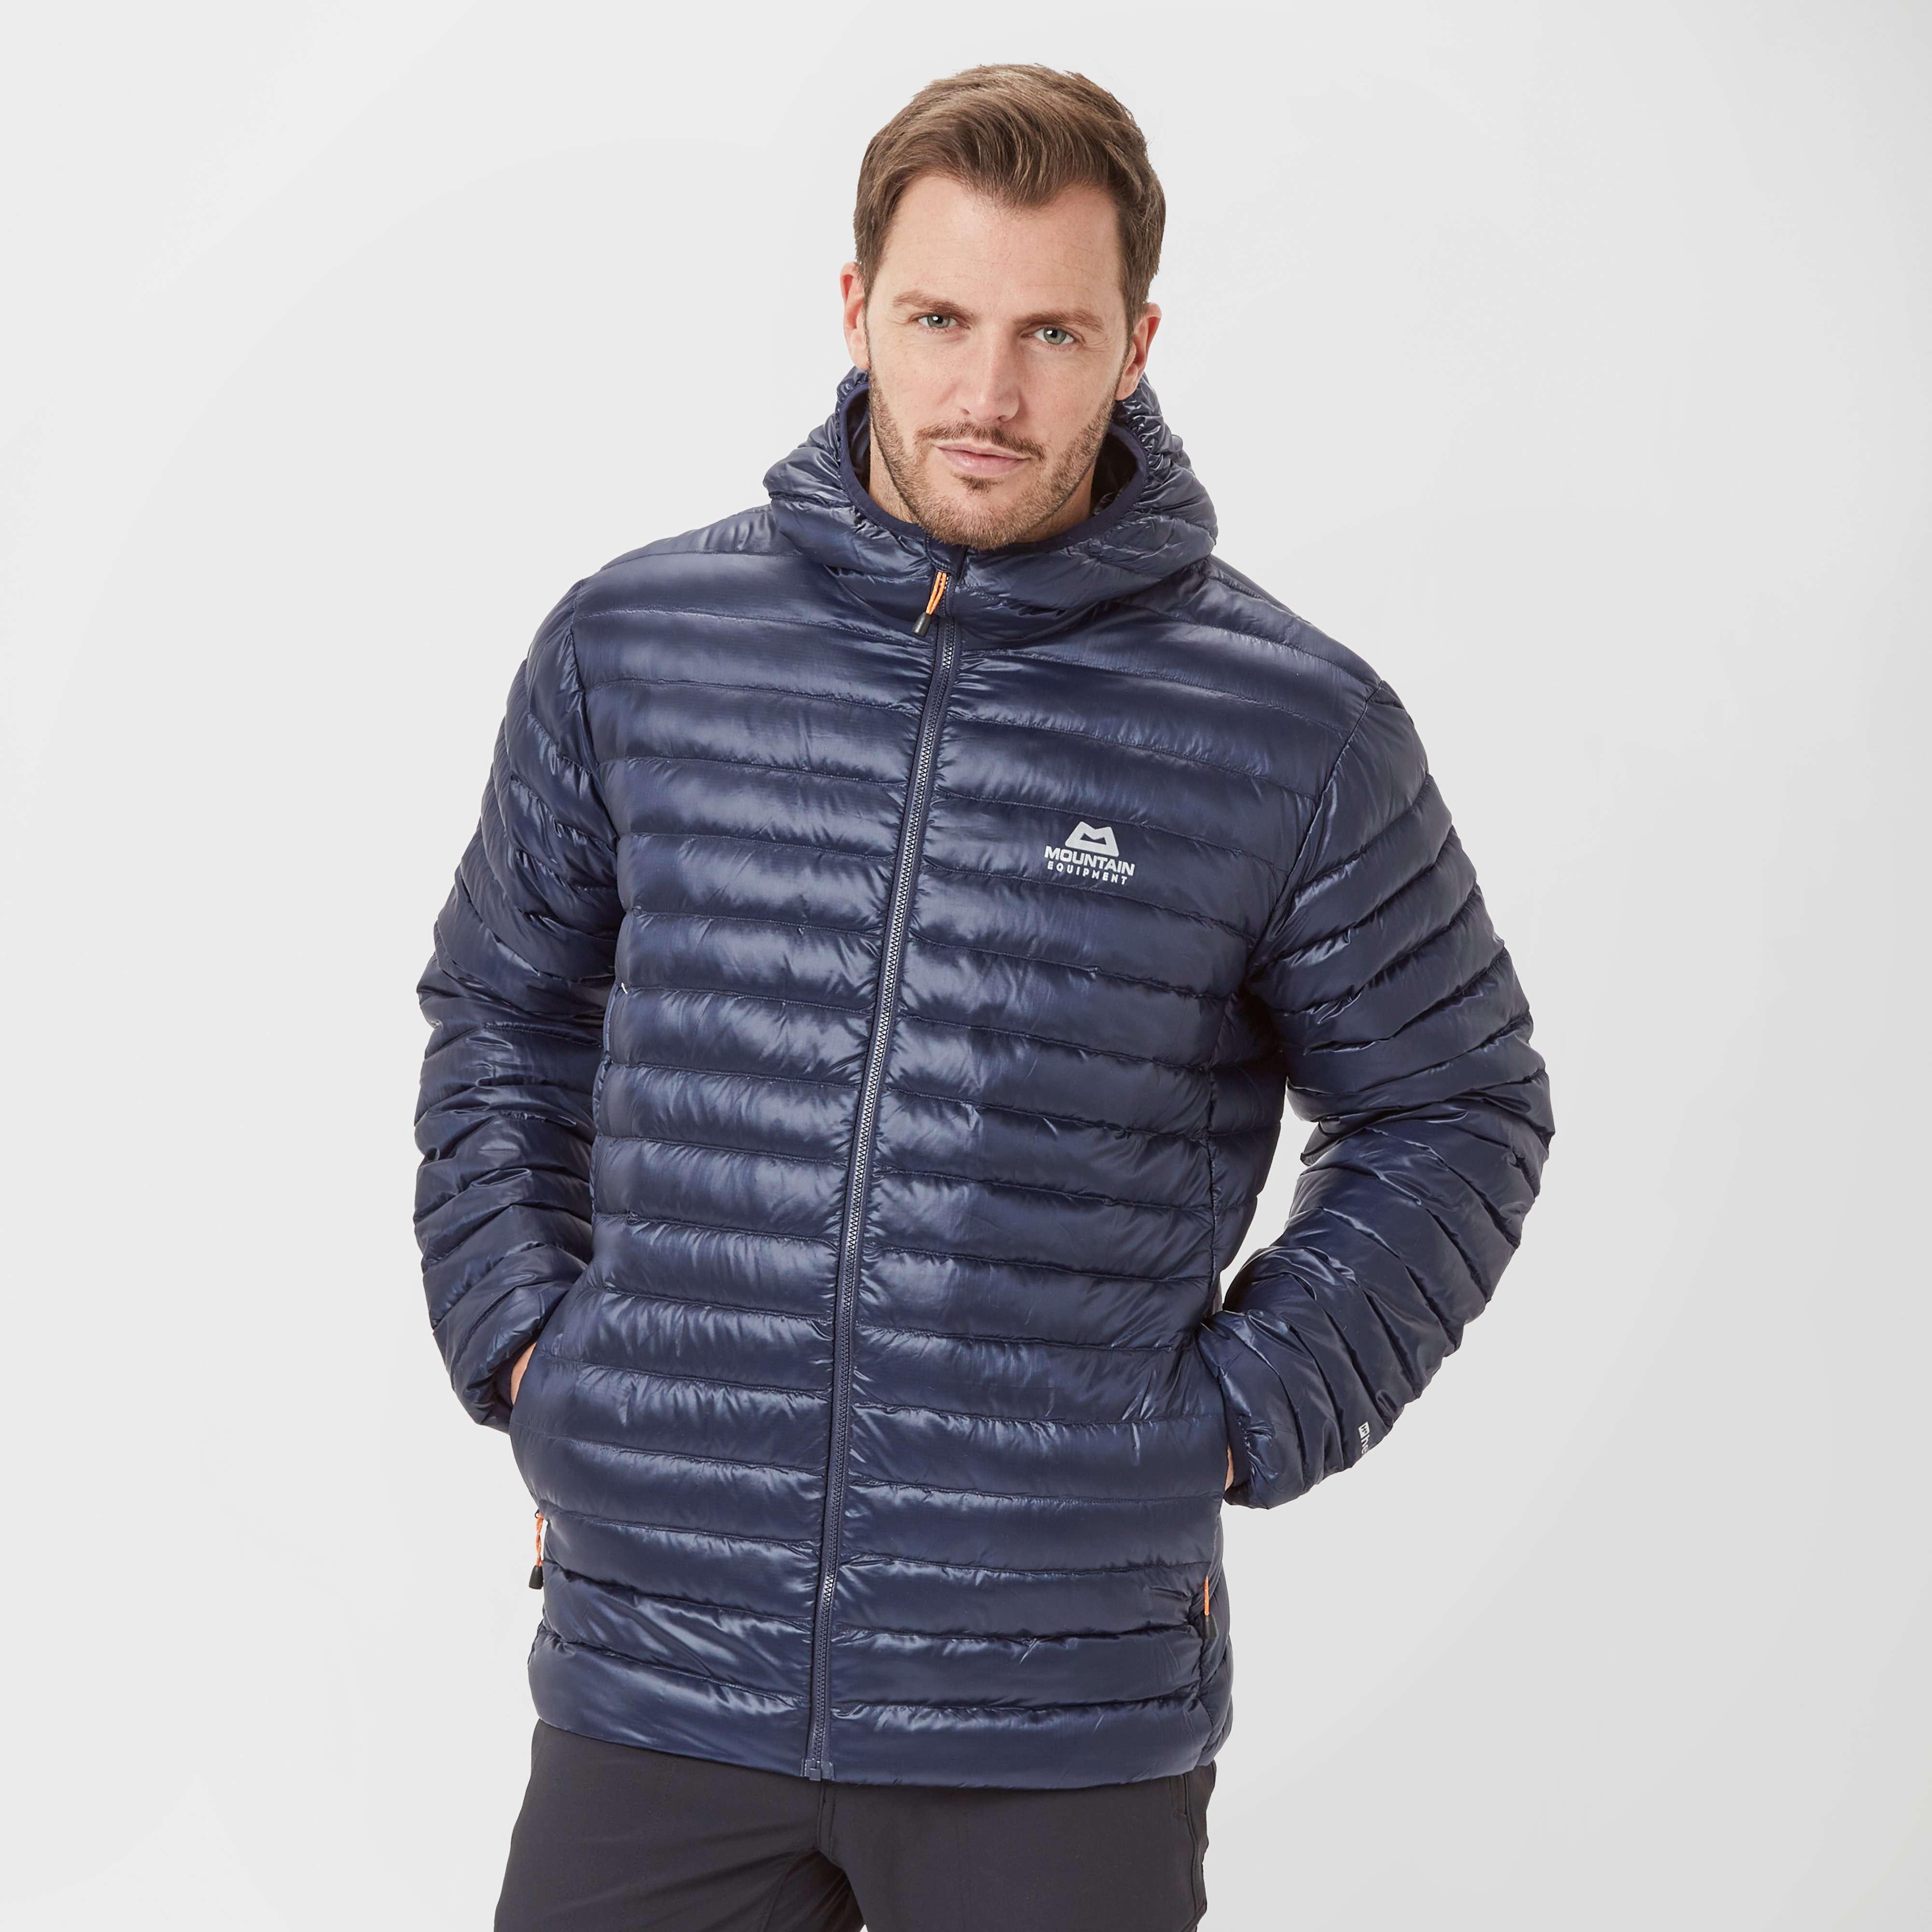 MOUNTAIN EQUIPMENT Men's Arete Hooded Down Jacket